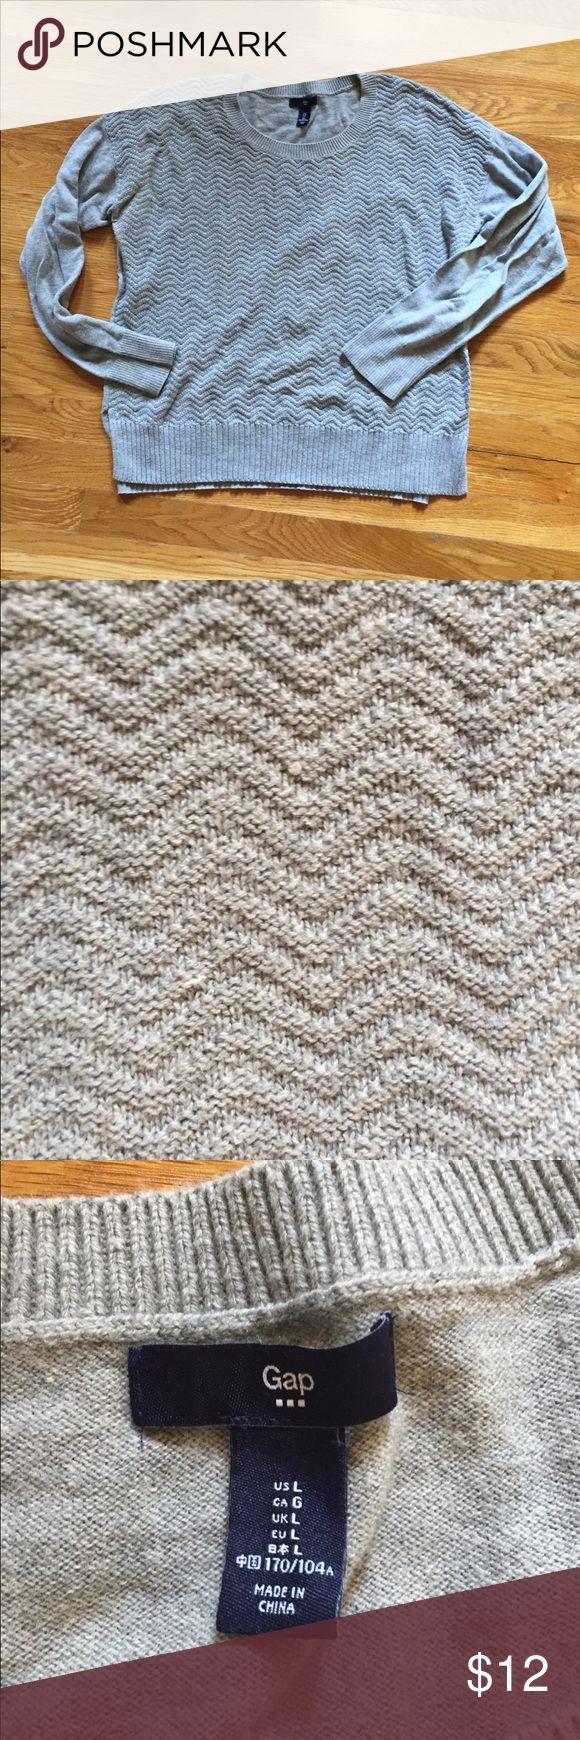 Gap sweater Lightweight gap sweater in great condition. GAP Sweaters Crew & Scoop Necks